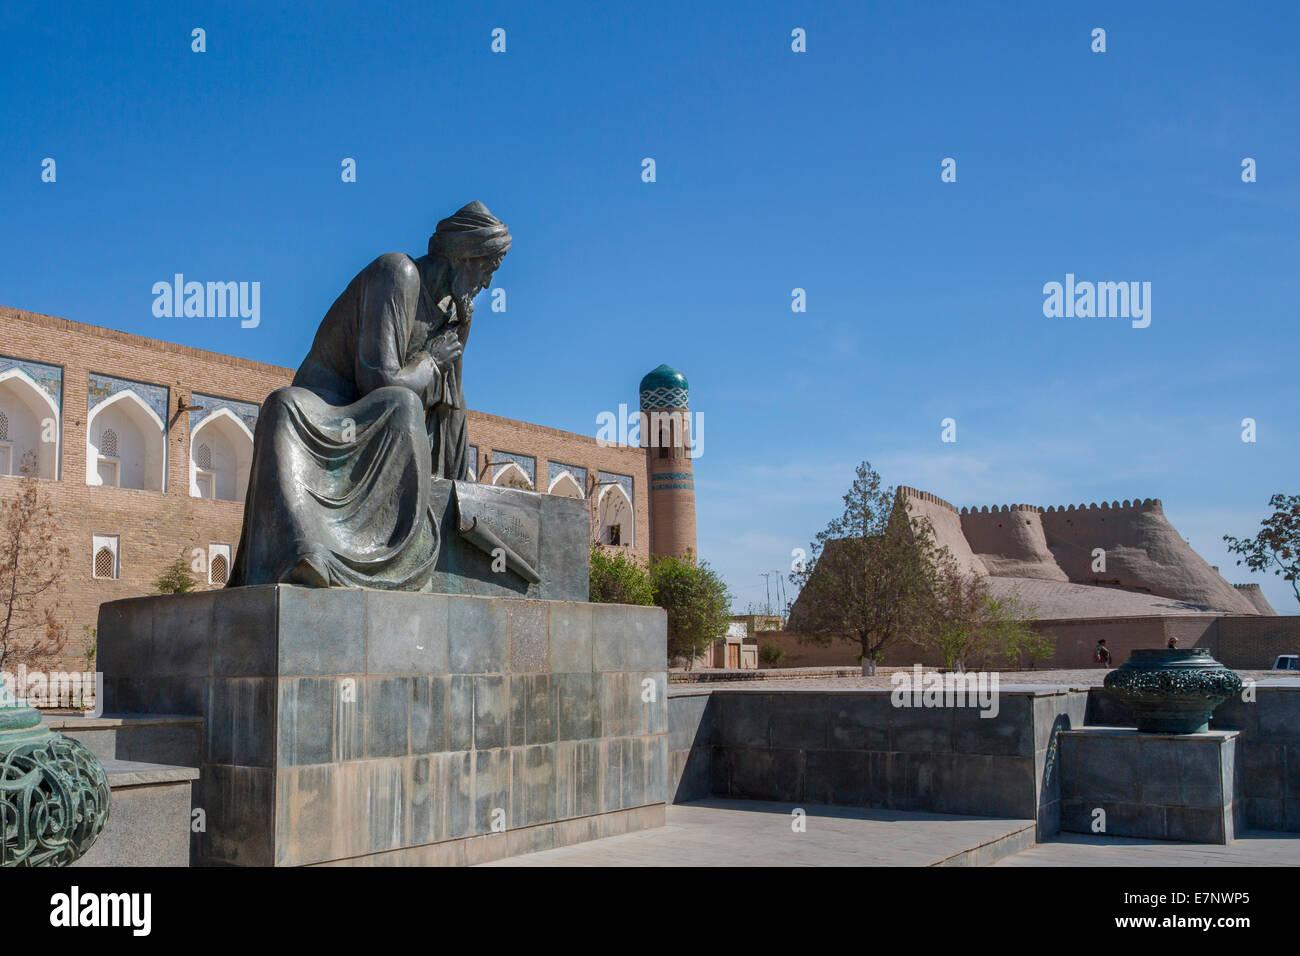 world heritage, Al-Khorezmi, Khiva, Khorezm, Region, Uzbekistan, Central Asia, Asia, architecture, city, history, - Stock Image